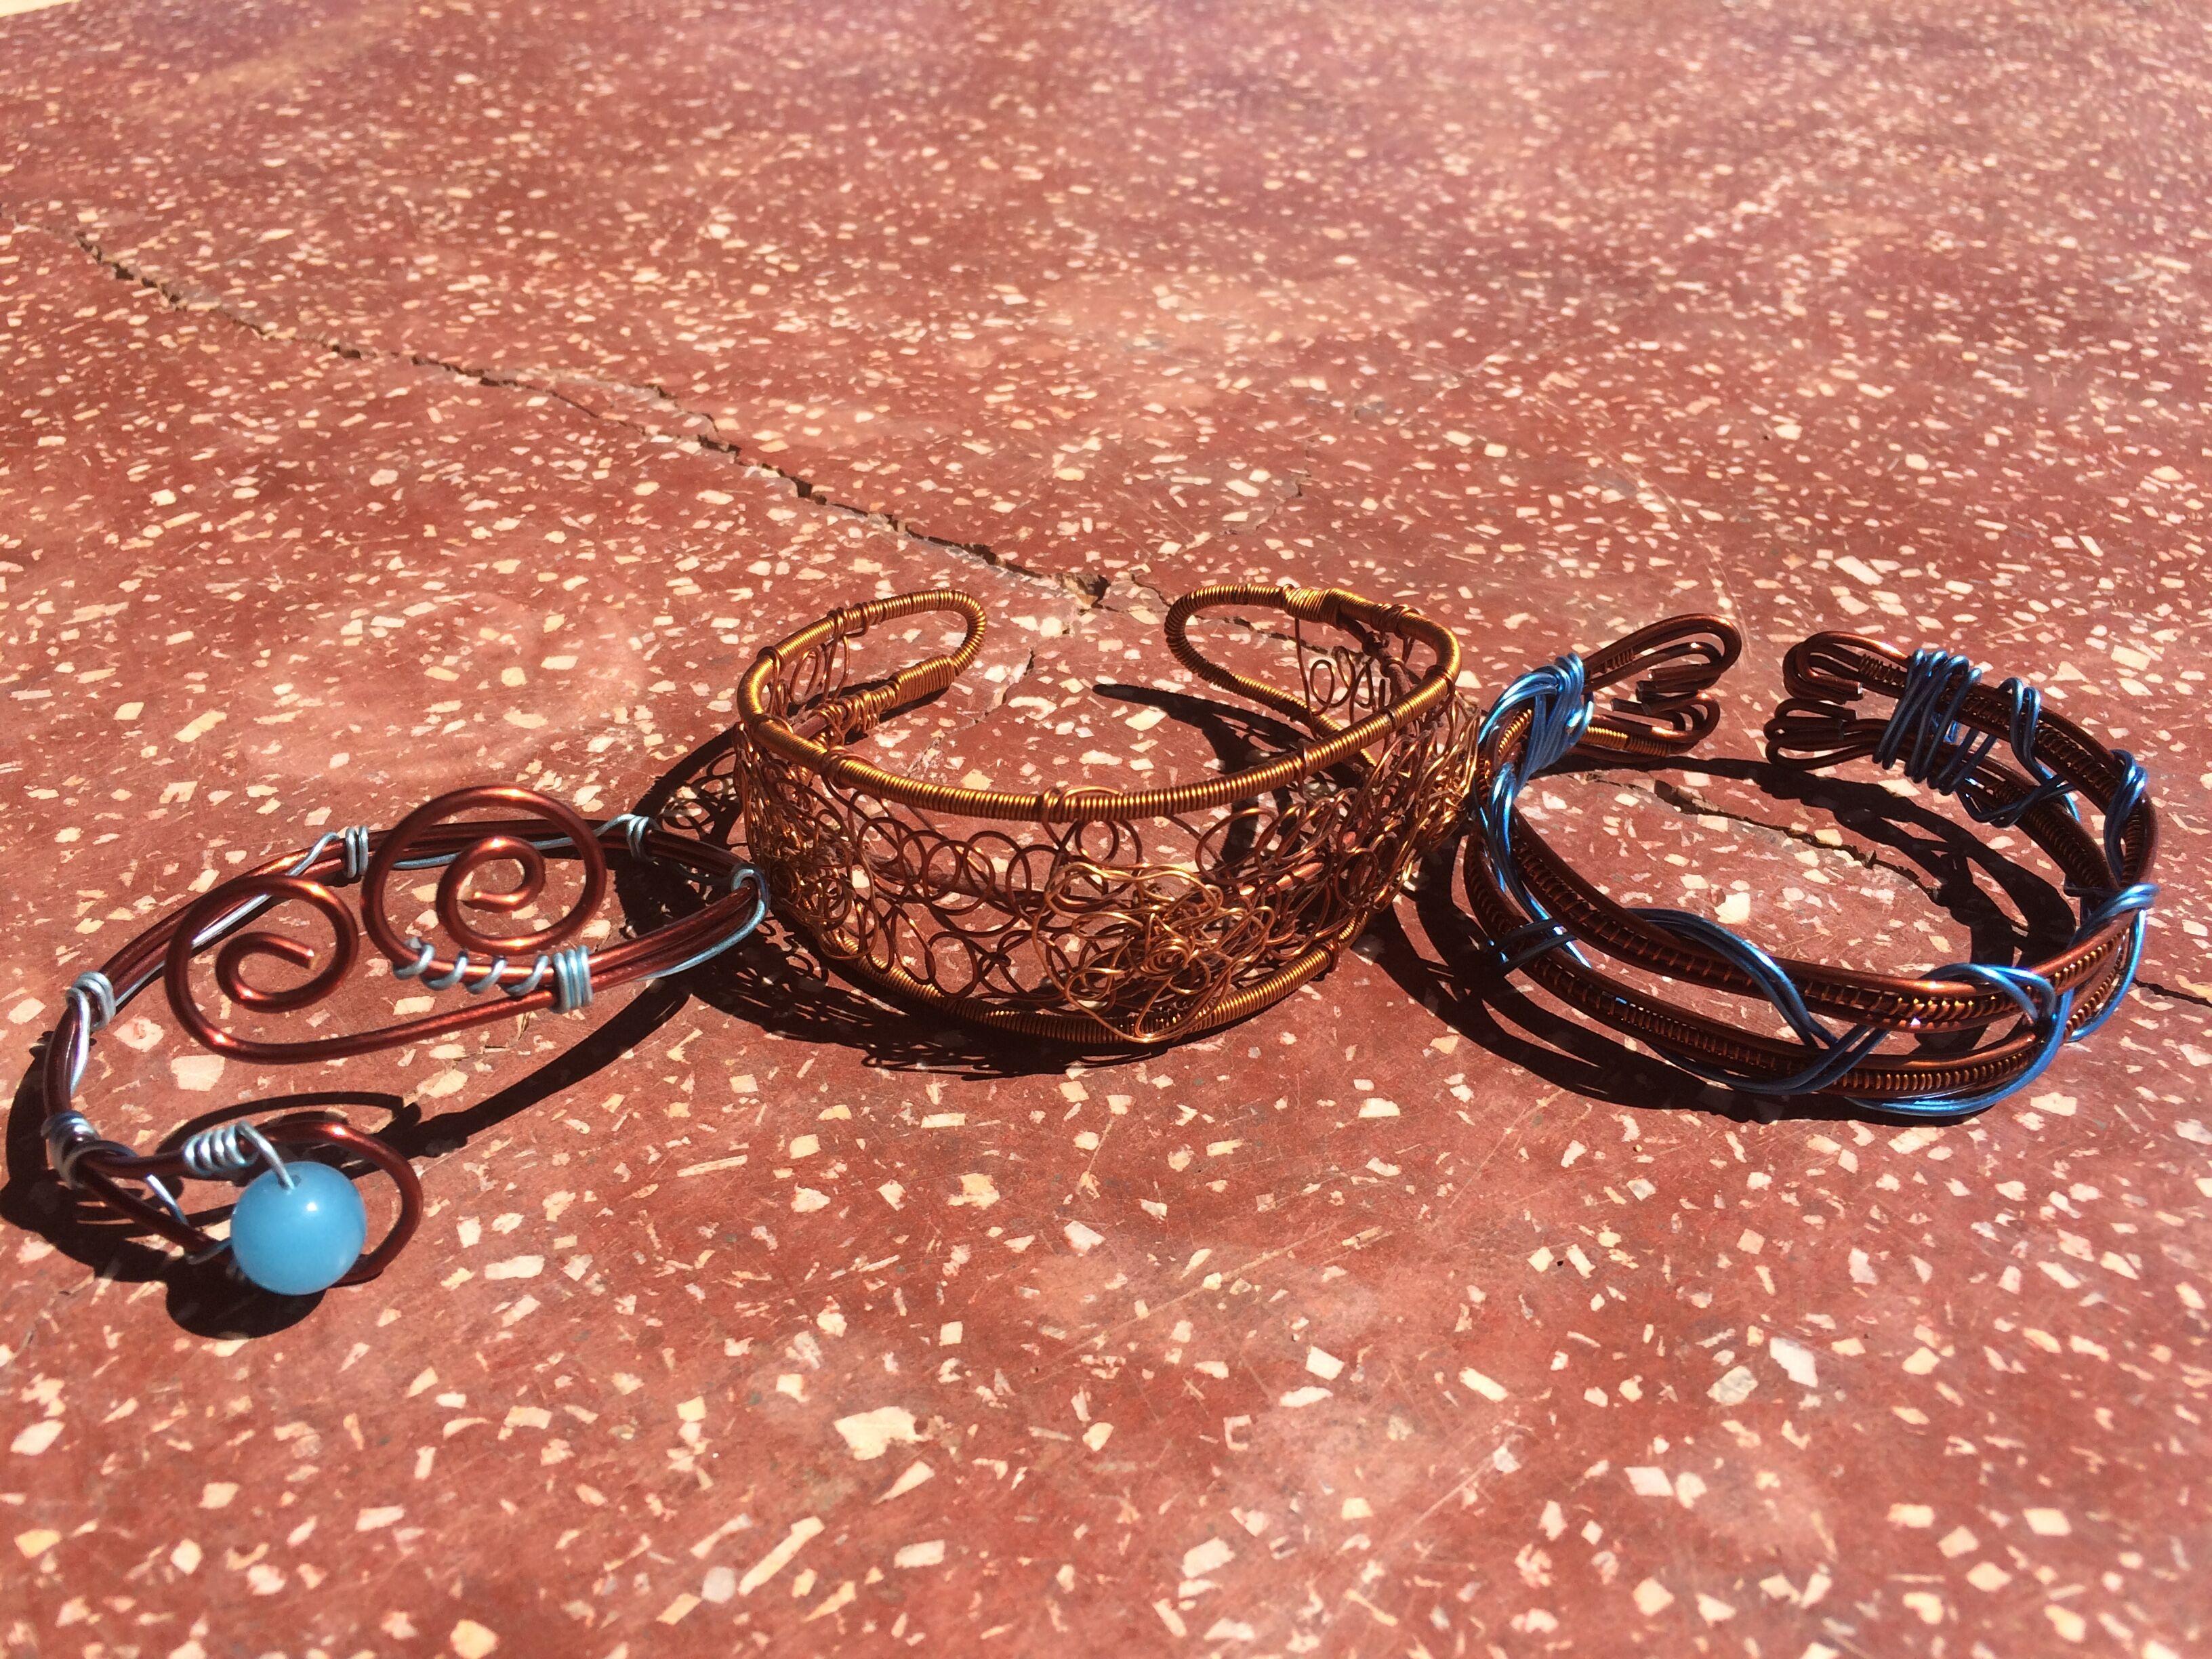 Bel's jewelry.